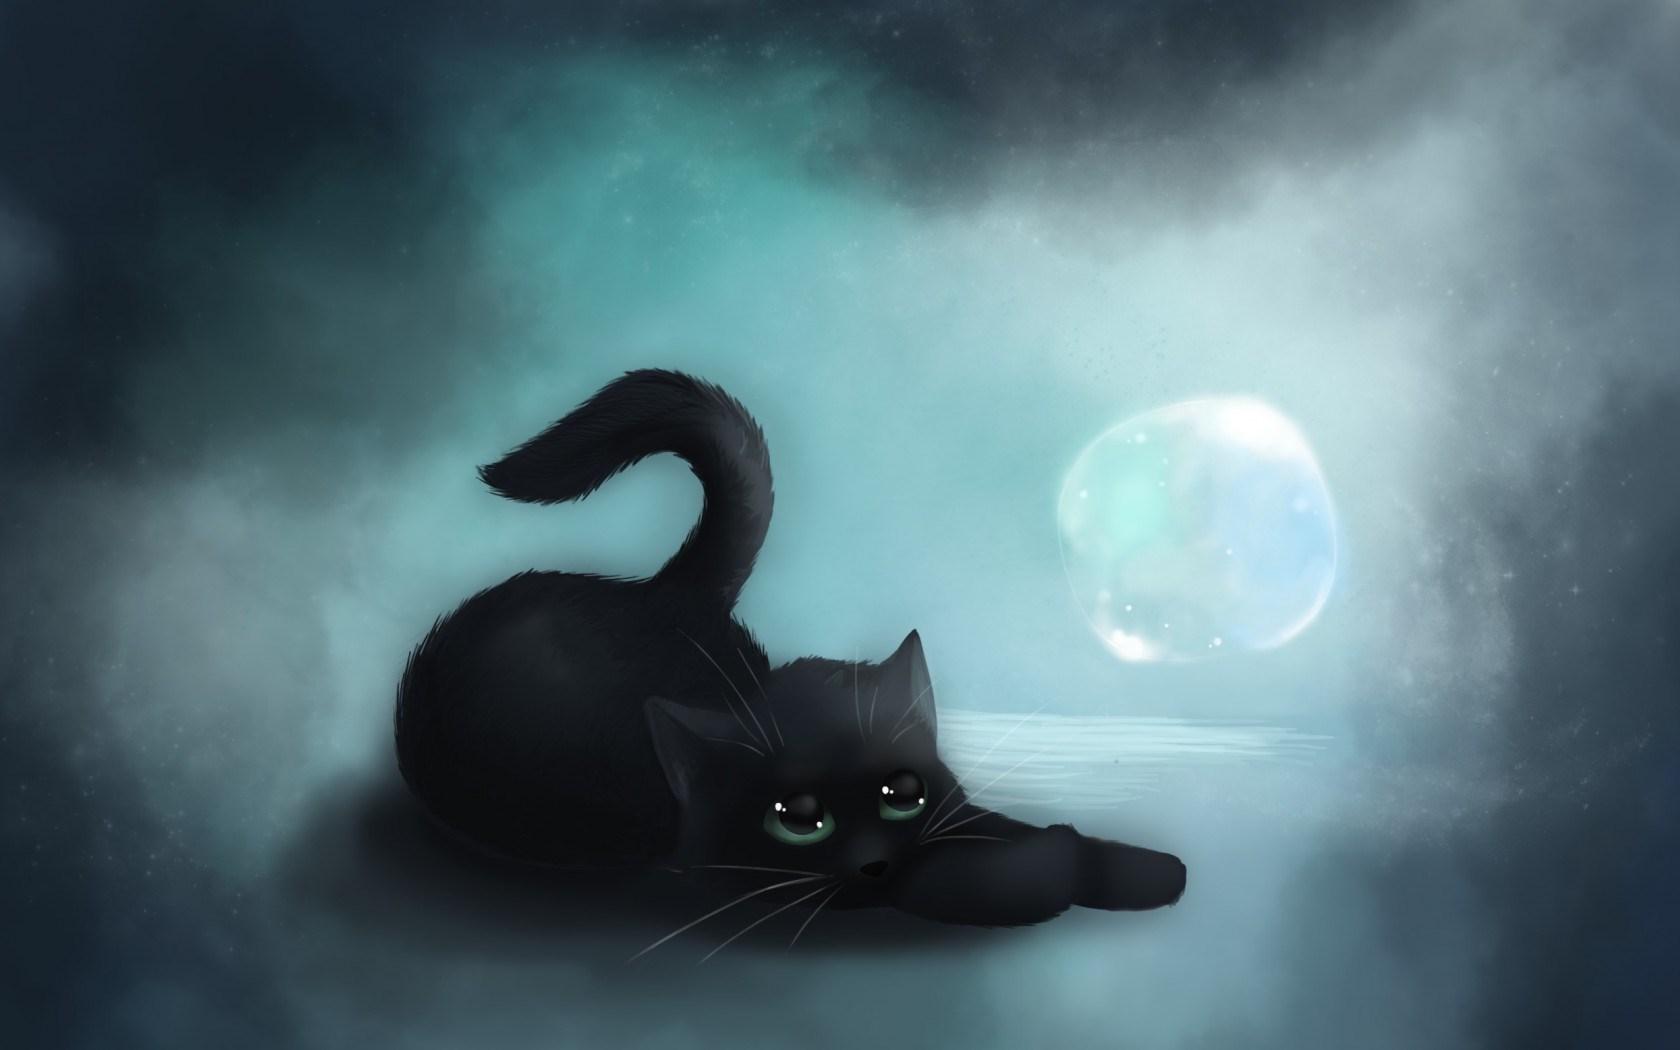 Free Download Black Cat In Moon Wallpaper Picture 12958 Wallpaper High Resolution 1680x1050 For Your Desktop Mobile Tablet Explore 48 Black Cat Wallpaper Drawings Cats Wallpaper Cat Wallpaper 1920x1080